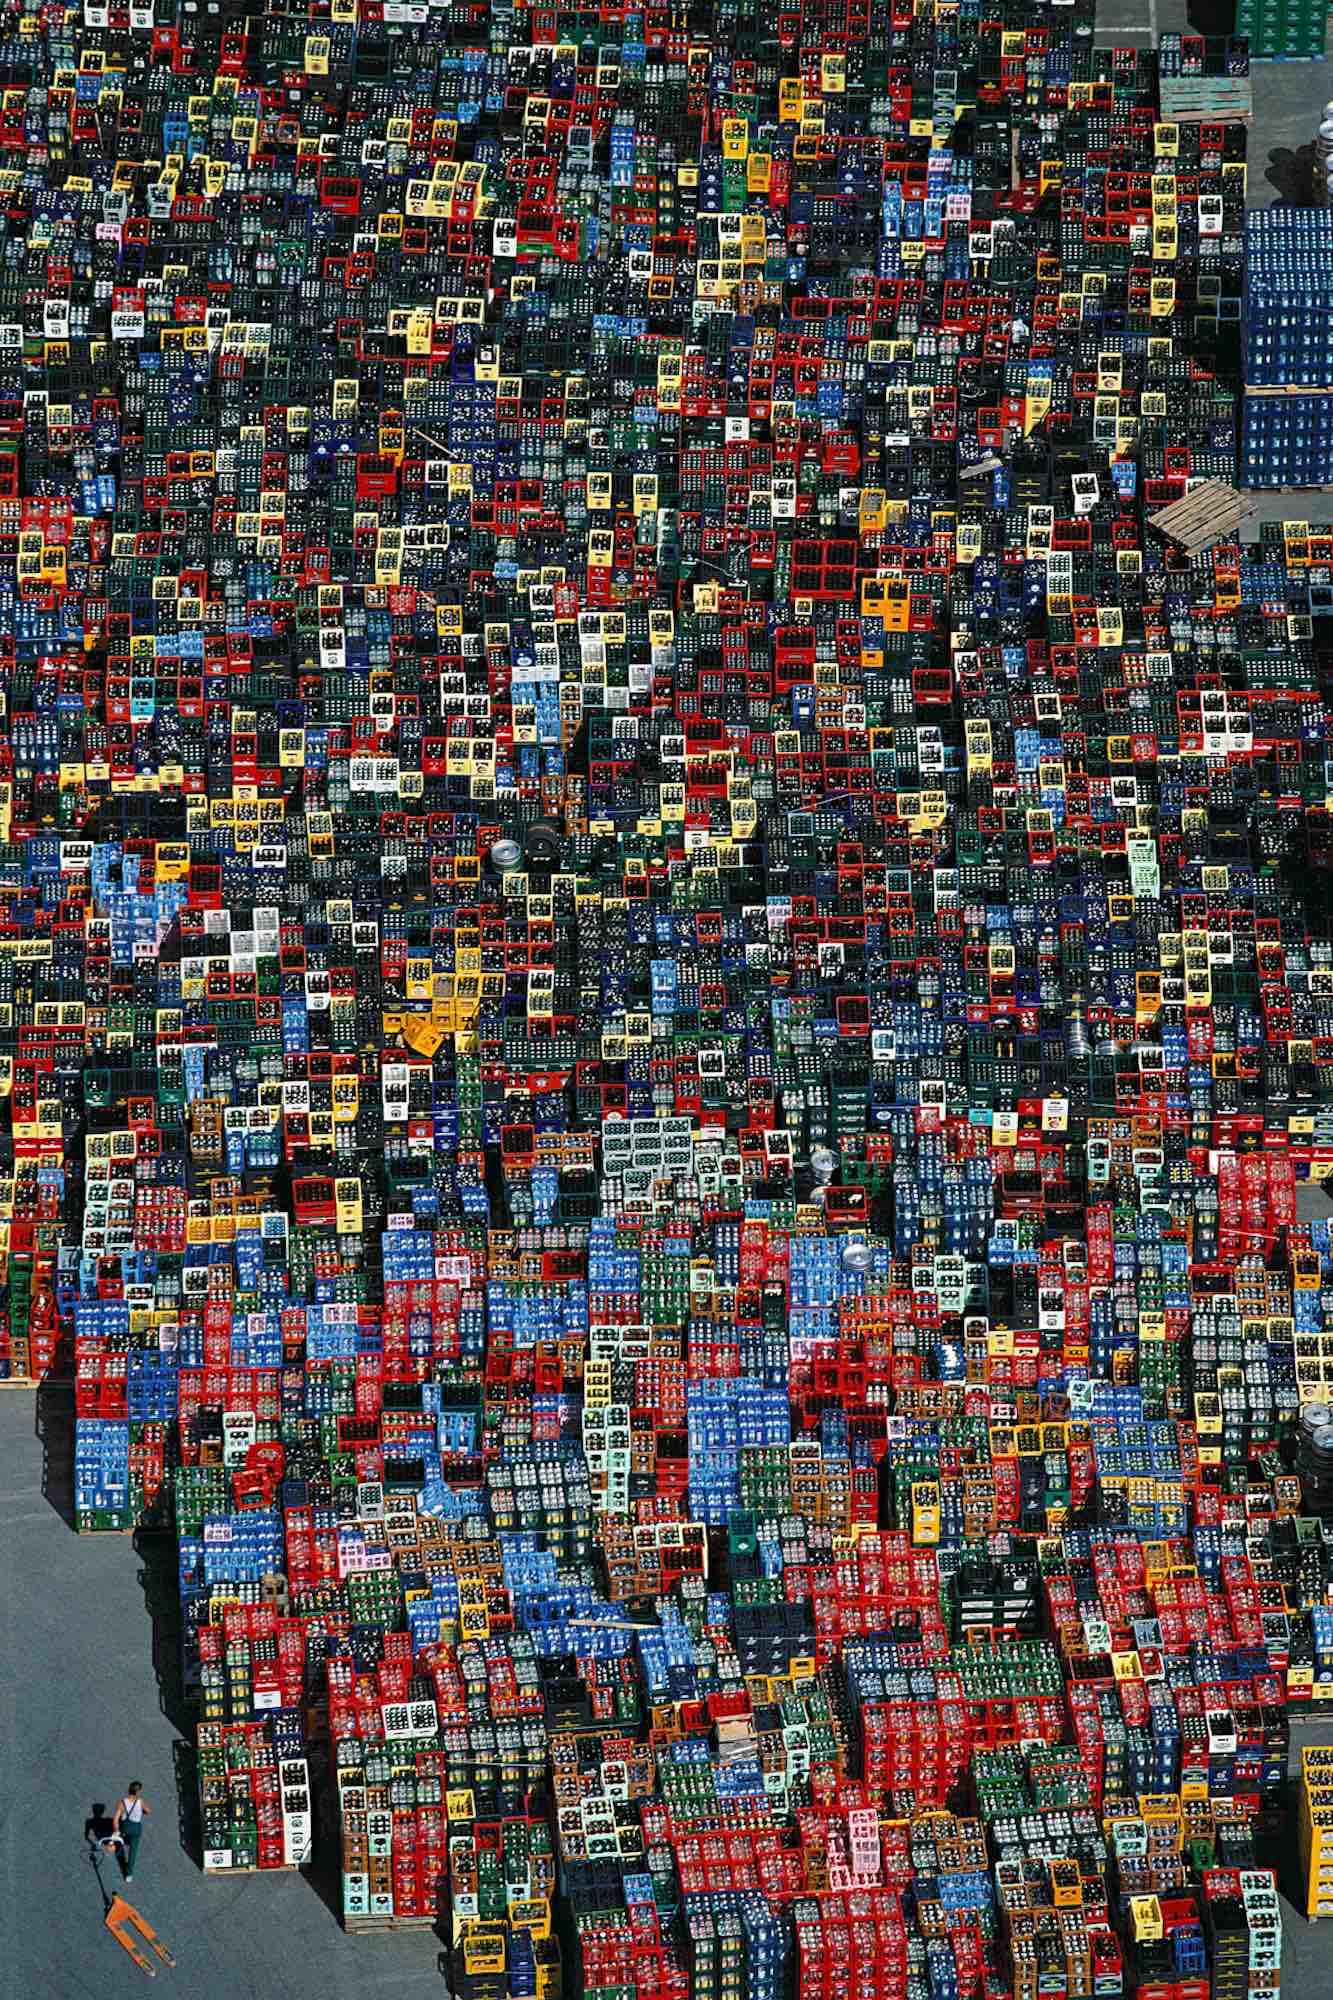 Bottles - Yann Arthus-Bertrand